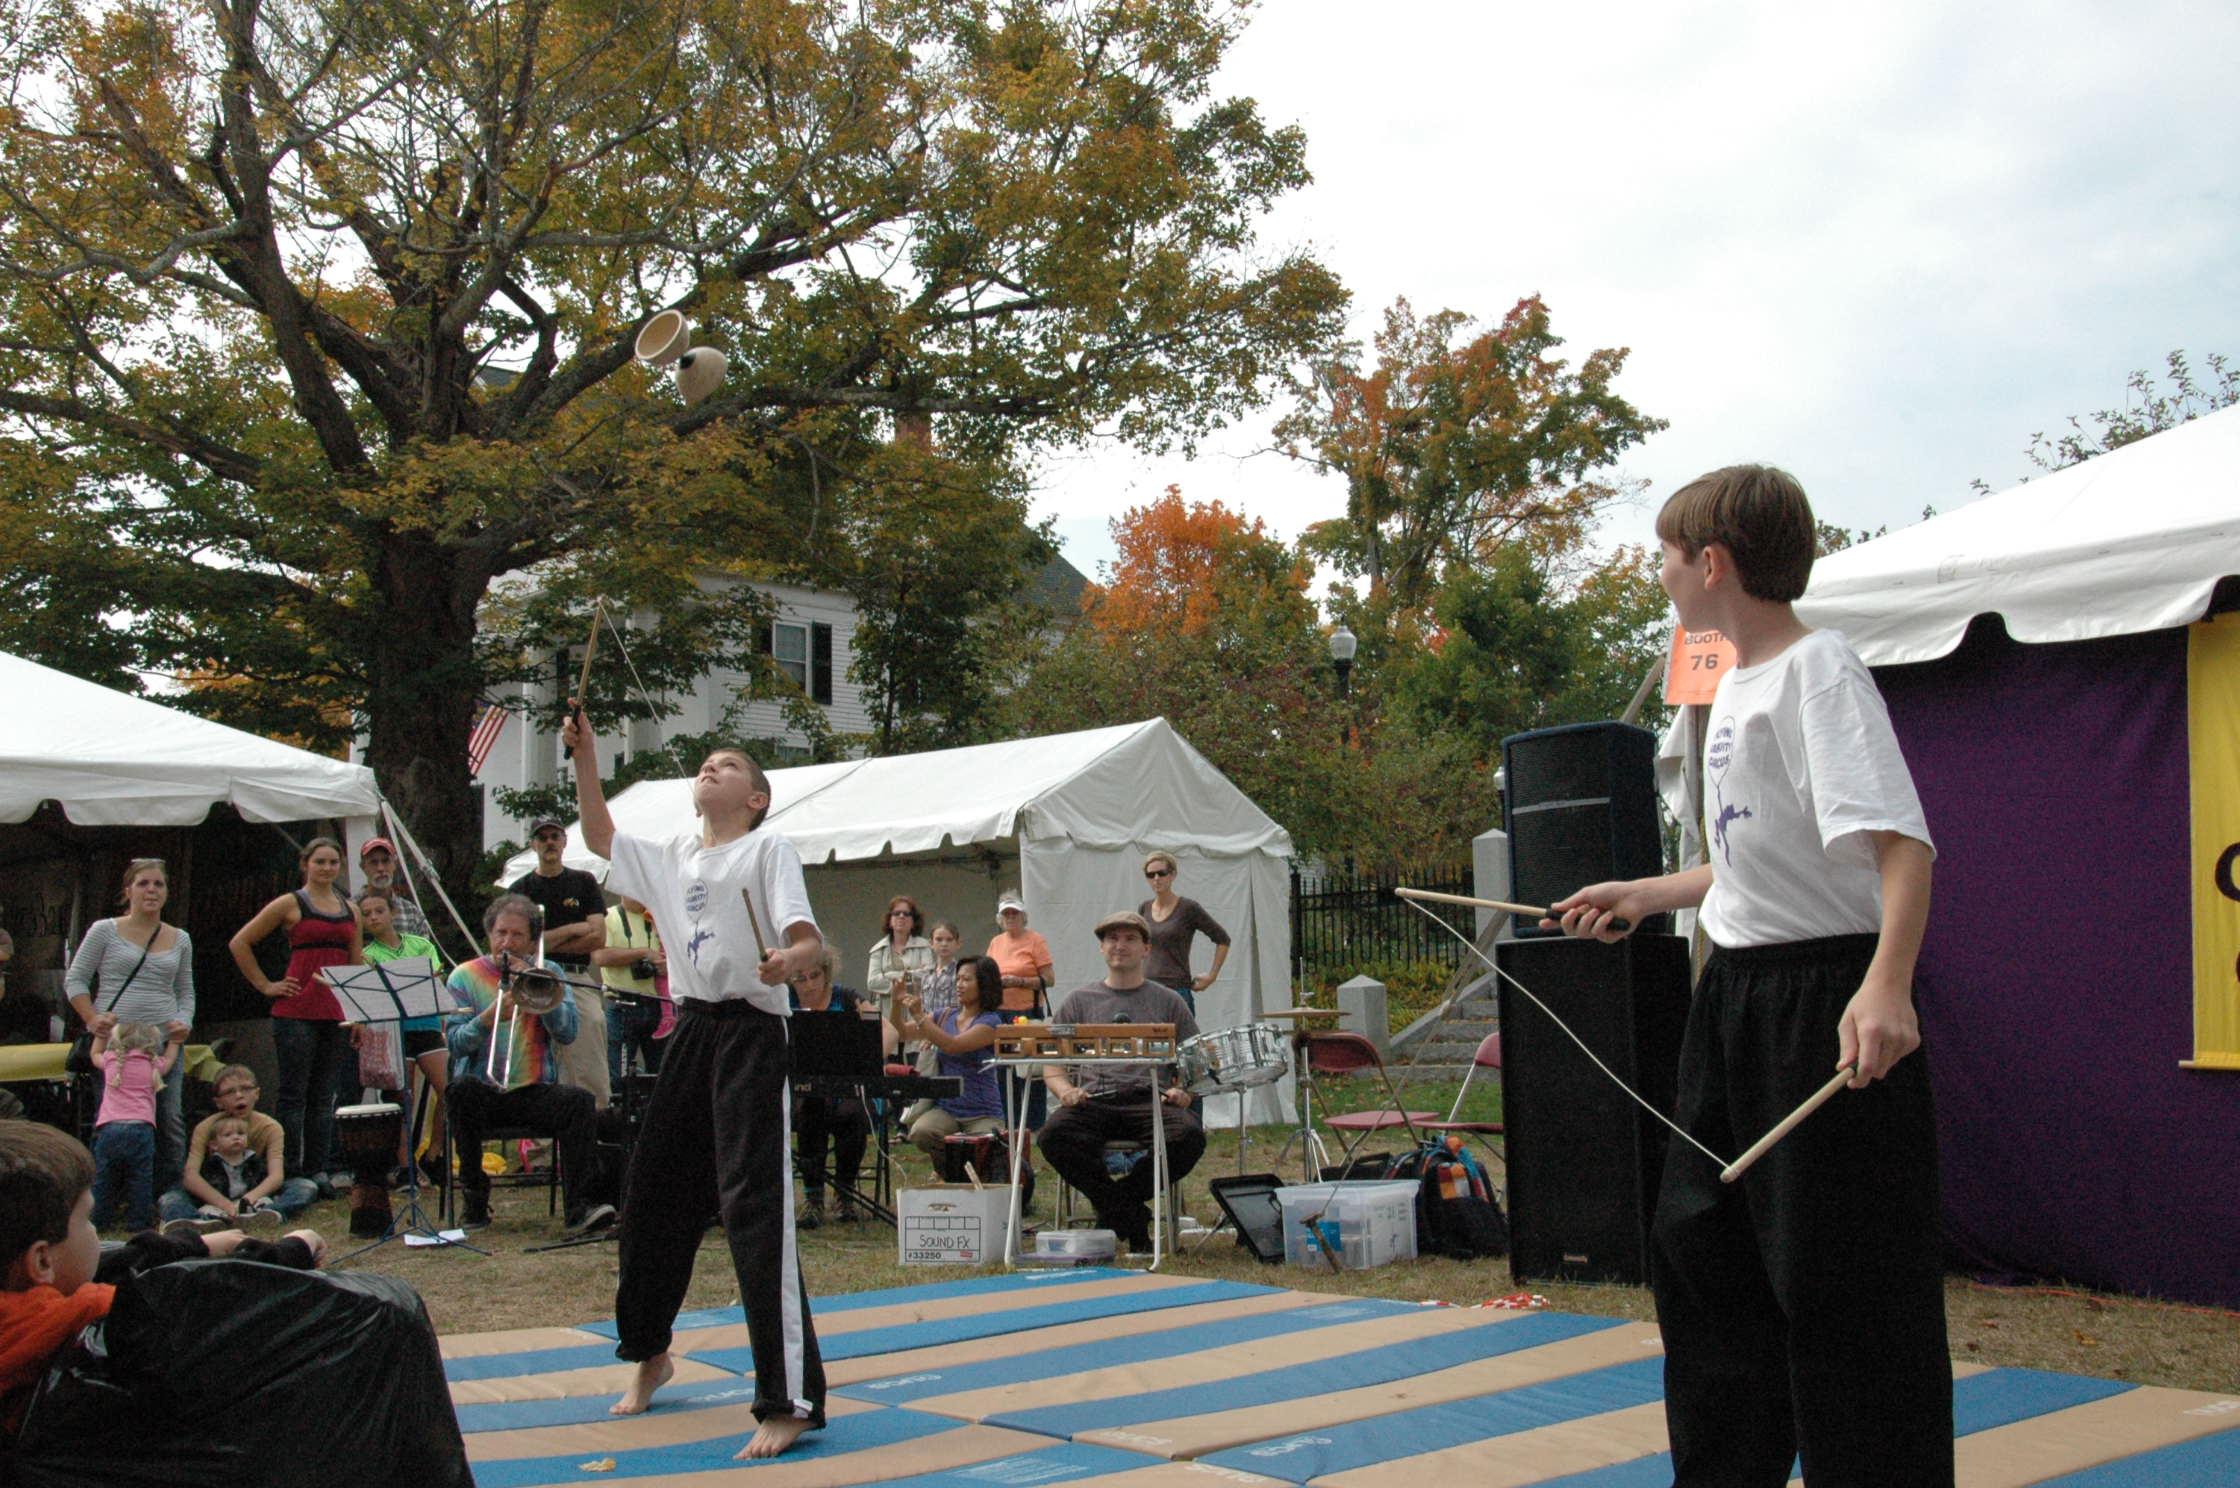 2012-10-06 Flyin Gravity Circus - Pumpkin 083.JPG